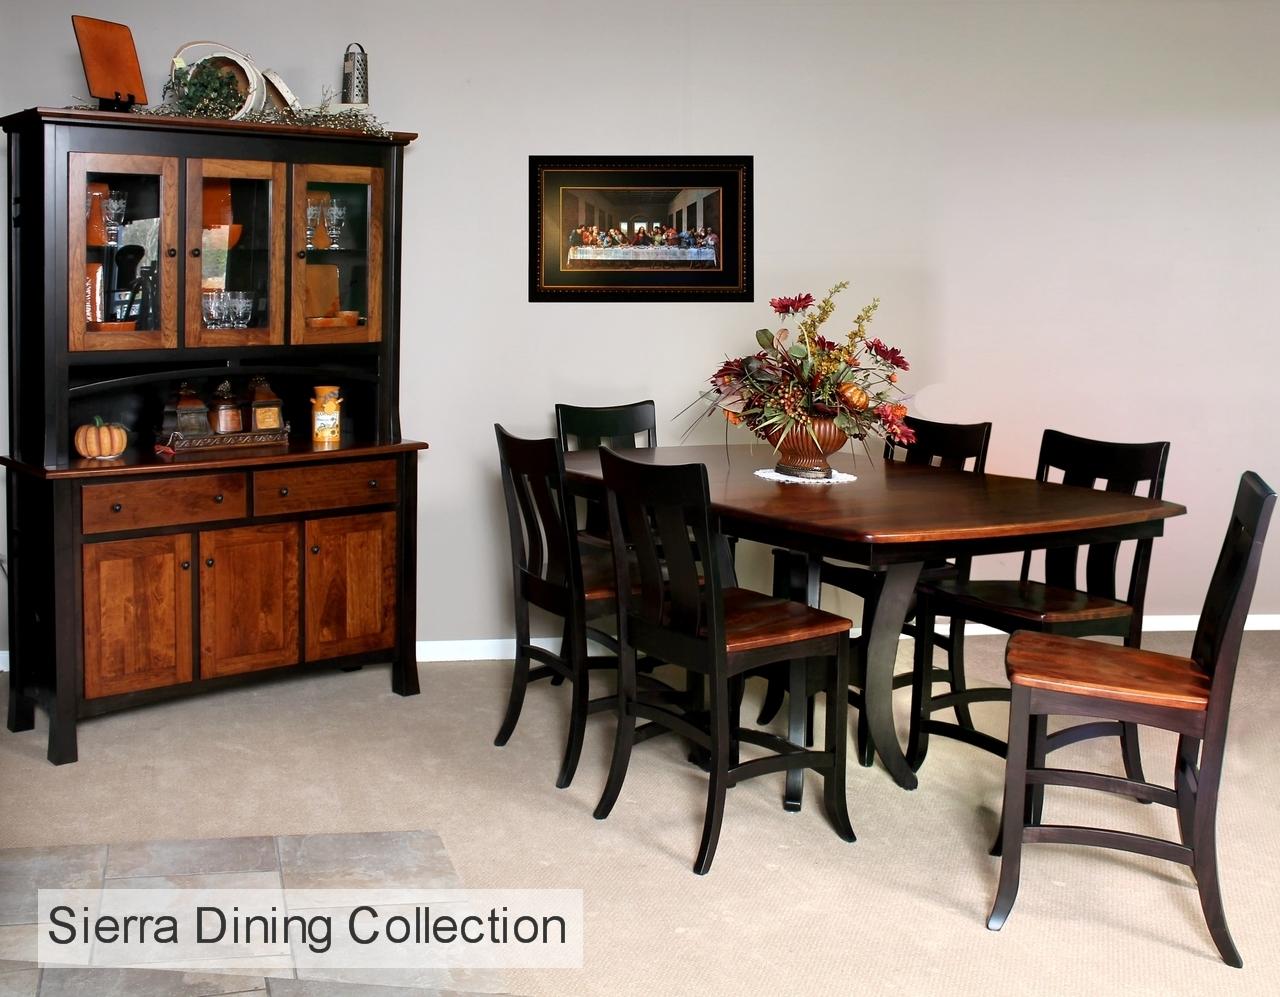 sierra-dining-collection-banner.jpg